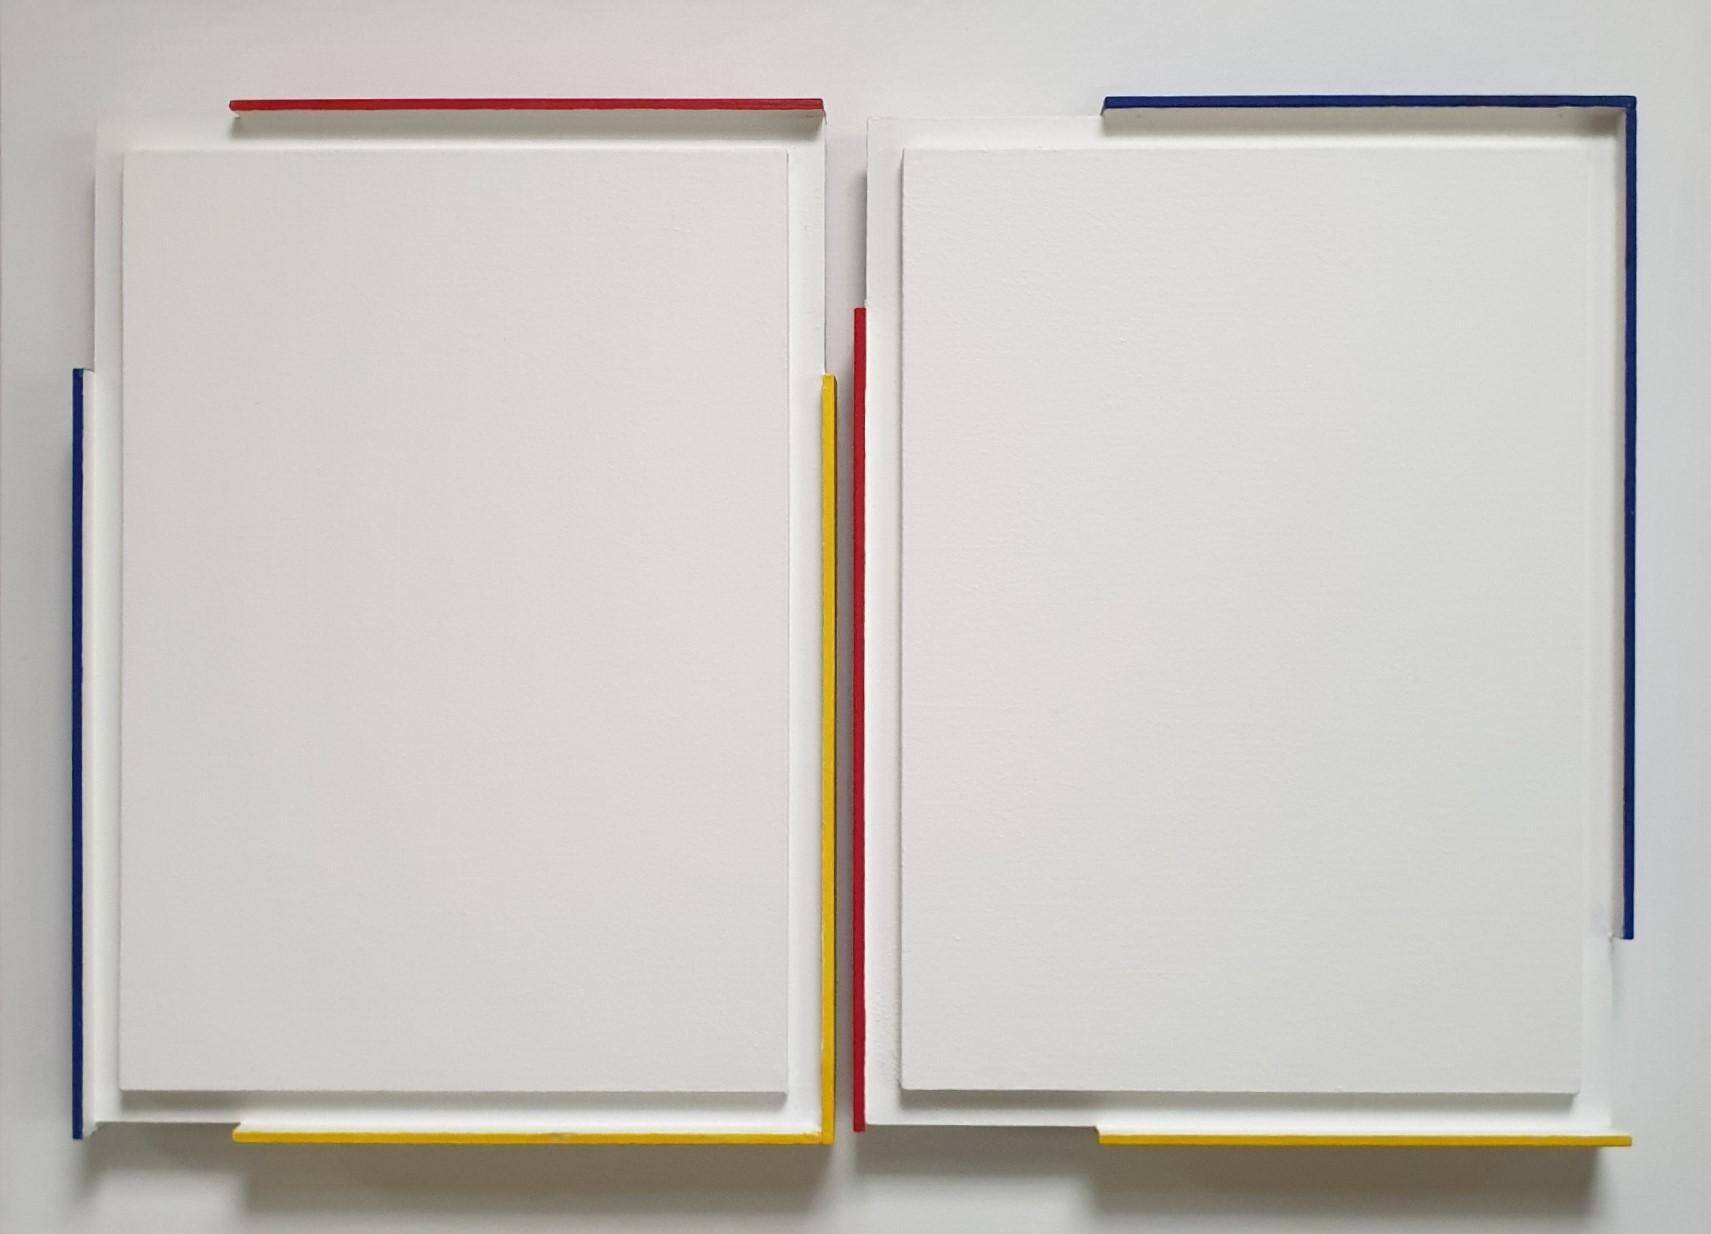 Double Contour du Blanc - contemporary modern Henri Prosi painting relief